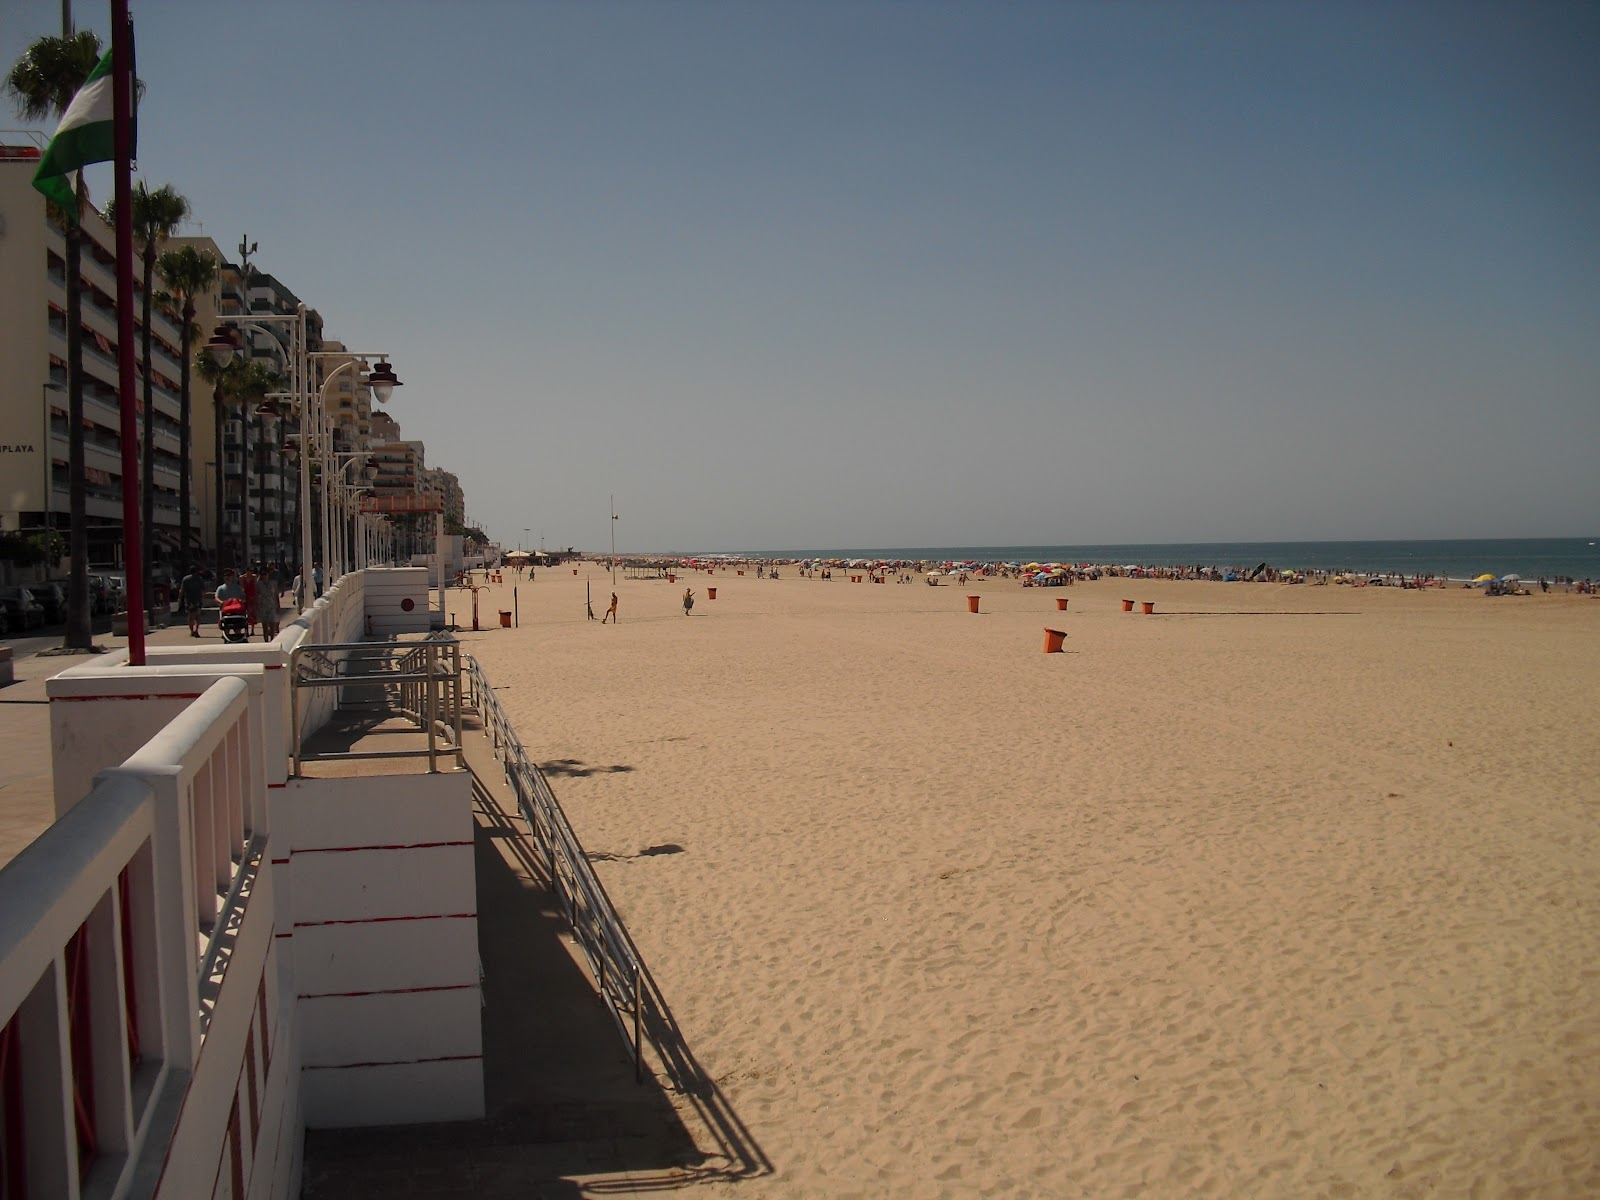 Playa Baja Piquiento